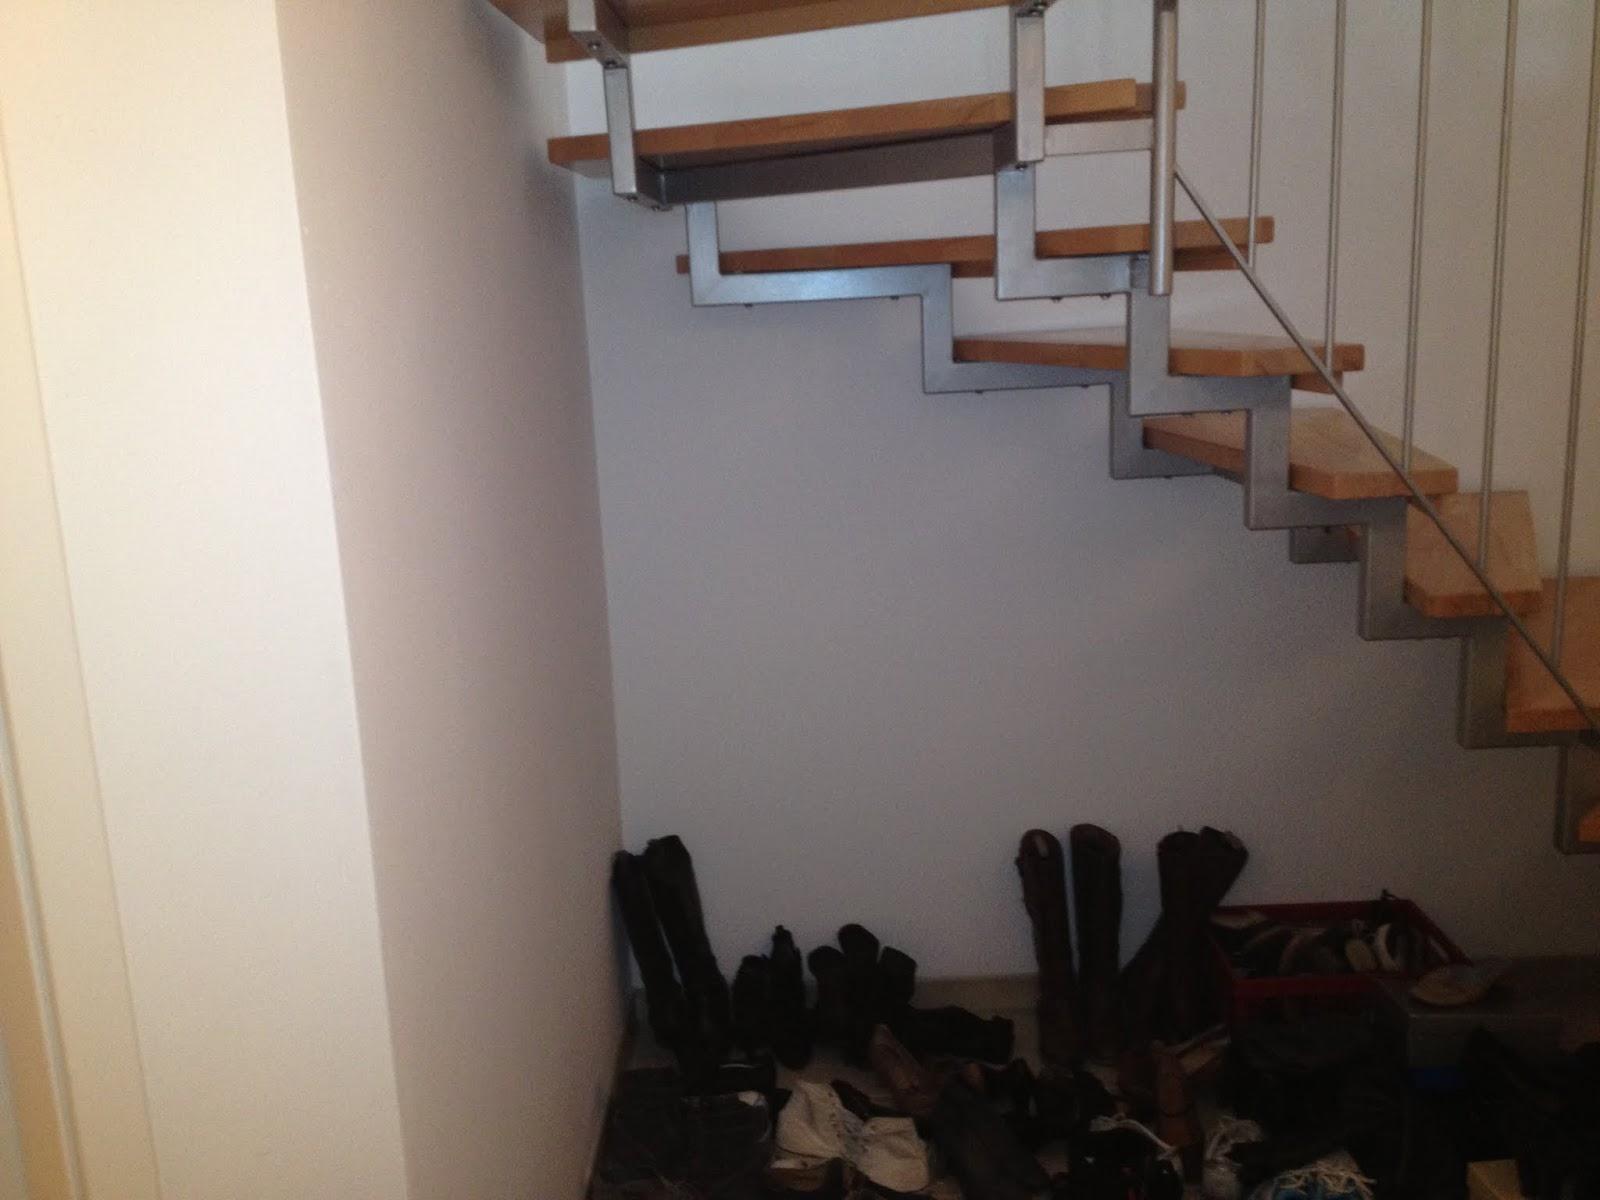 regal treppe selber bauen schuhr hrenregal obi regal selber bauen 50 kreative ideen wie sie. Black Bedroom Furniture Sets. Home Design Ideas